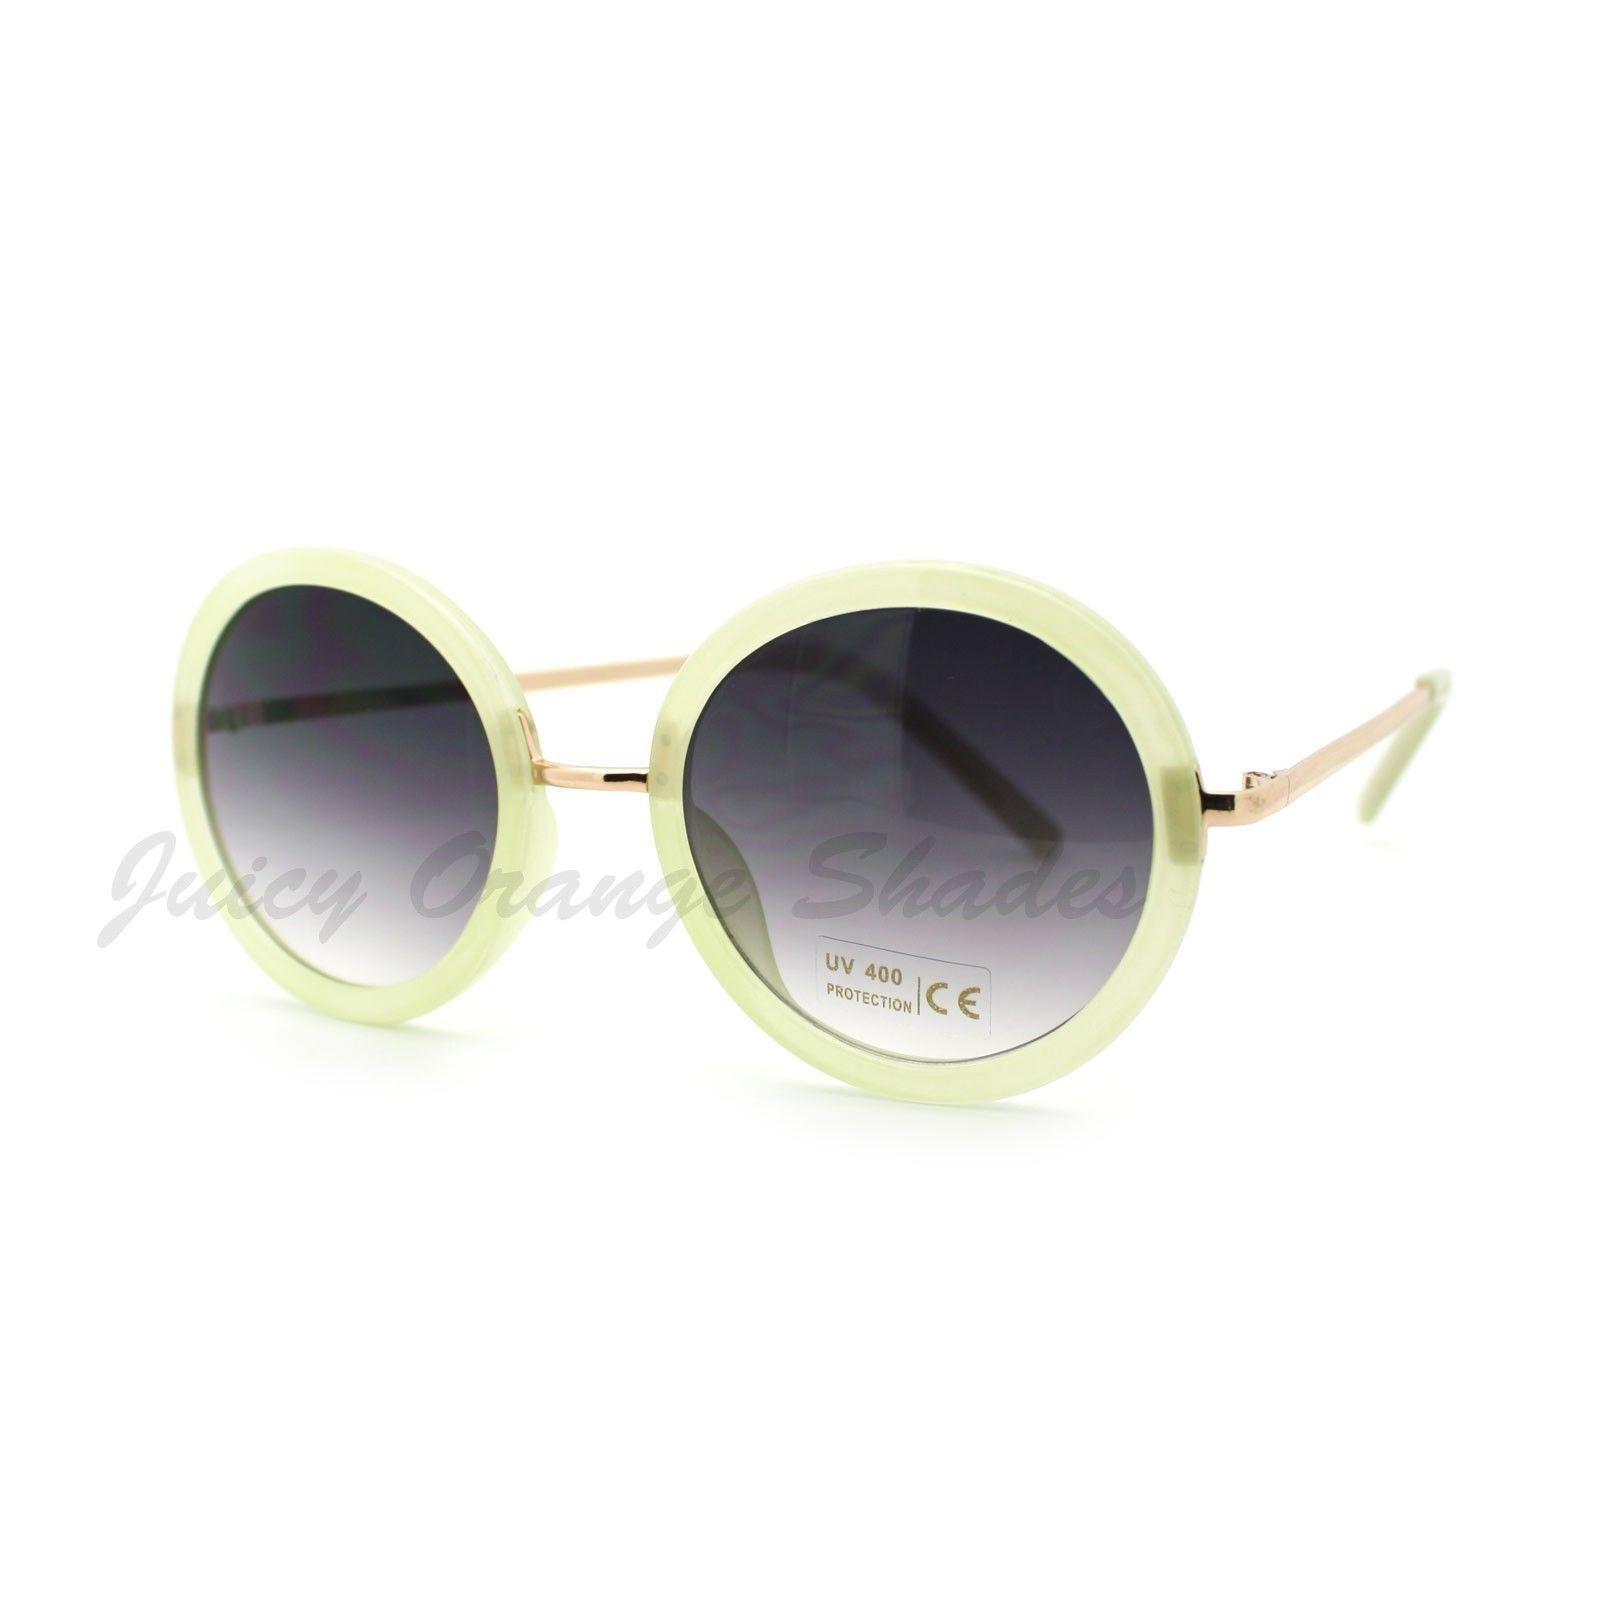 Vintage Retro Round Circle Sunglasses Womens Fashion Eyewear